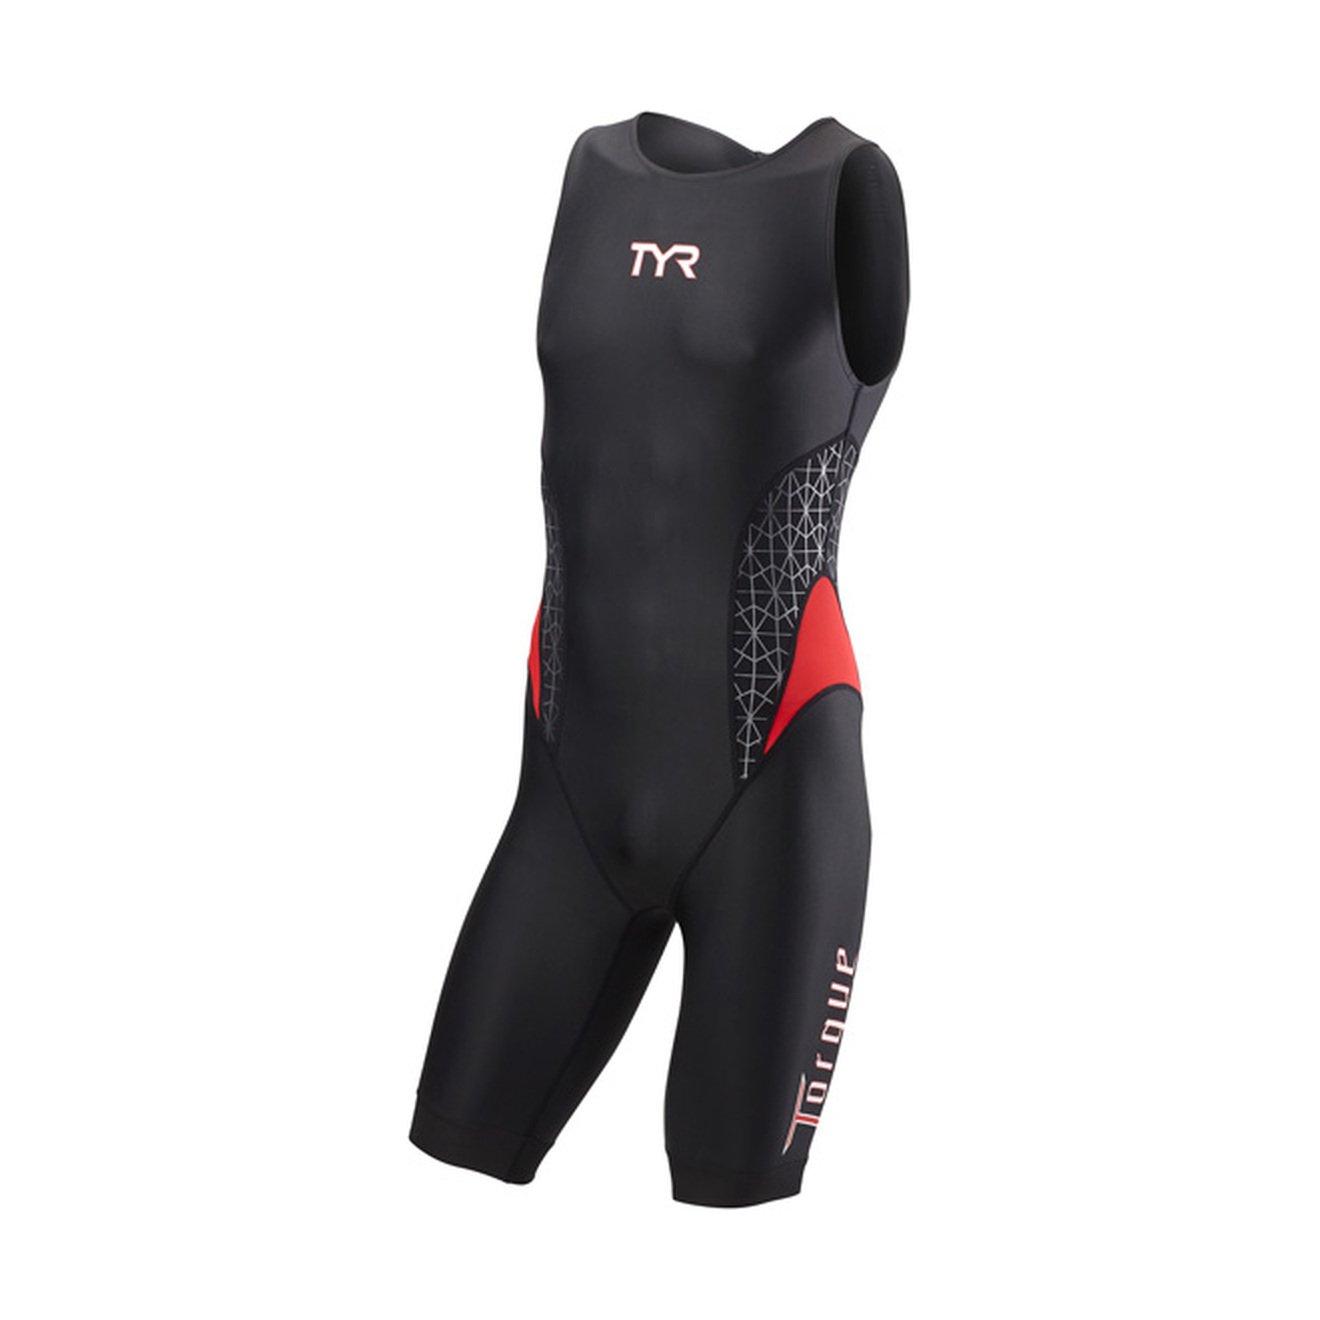 TYRトルクPro Men 's Swimskin :ブラック/レッドXL   B01NAZKFLE